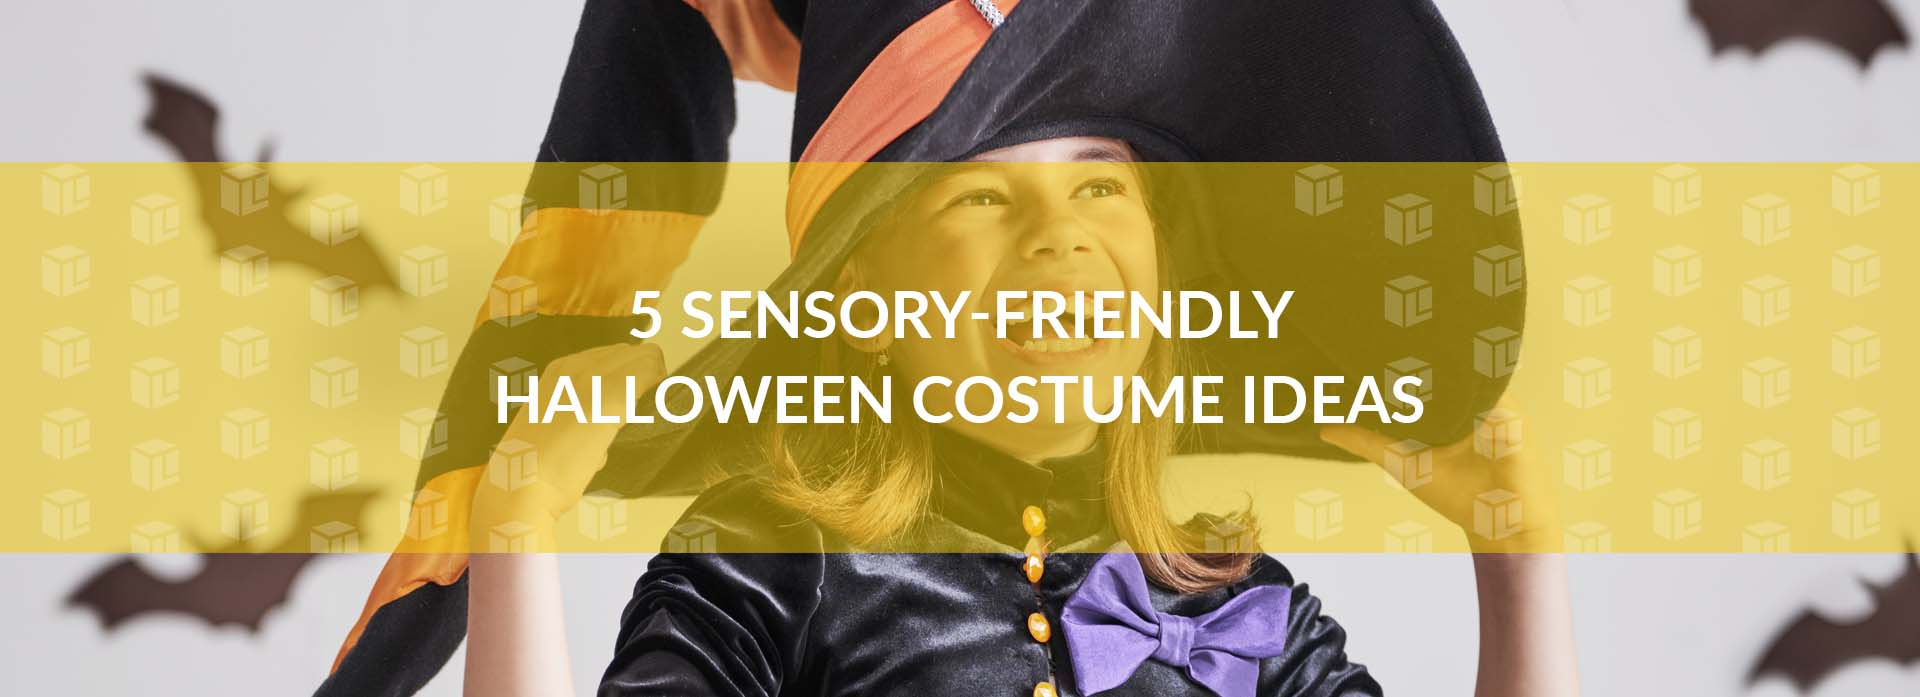 5 Sensory-Friendly Halloween Costume Ideas